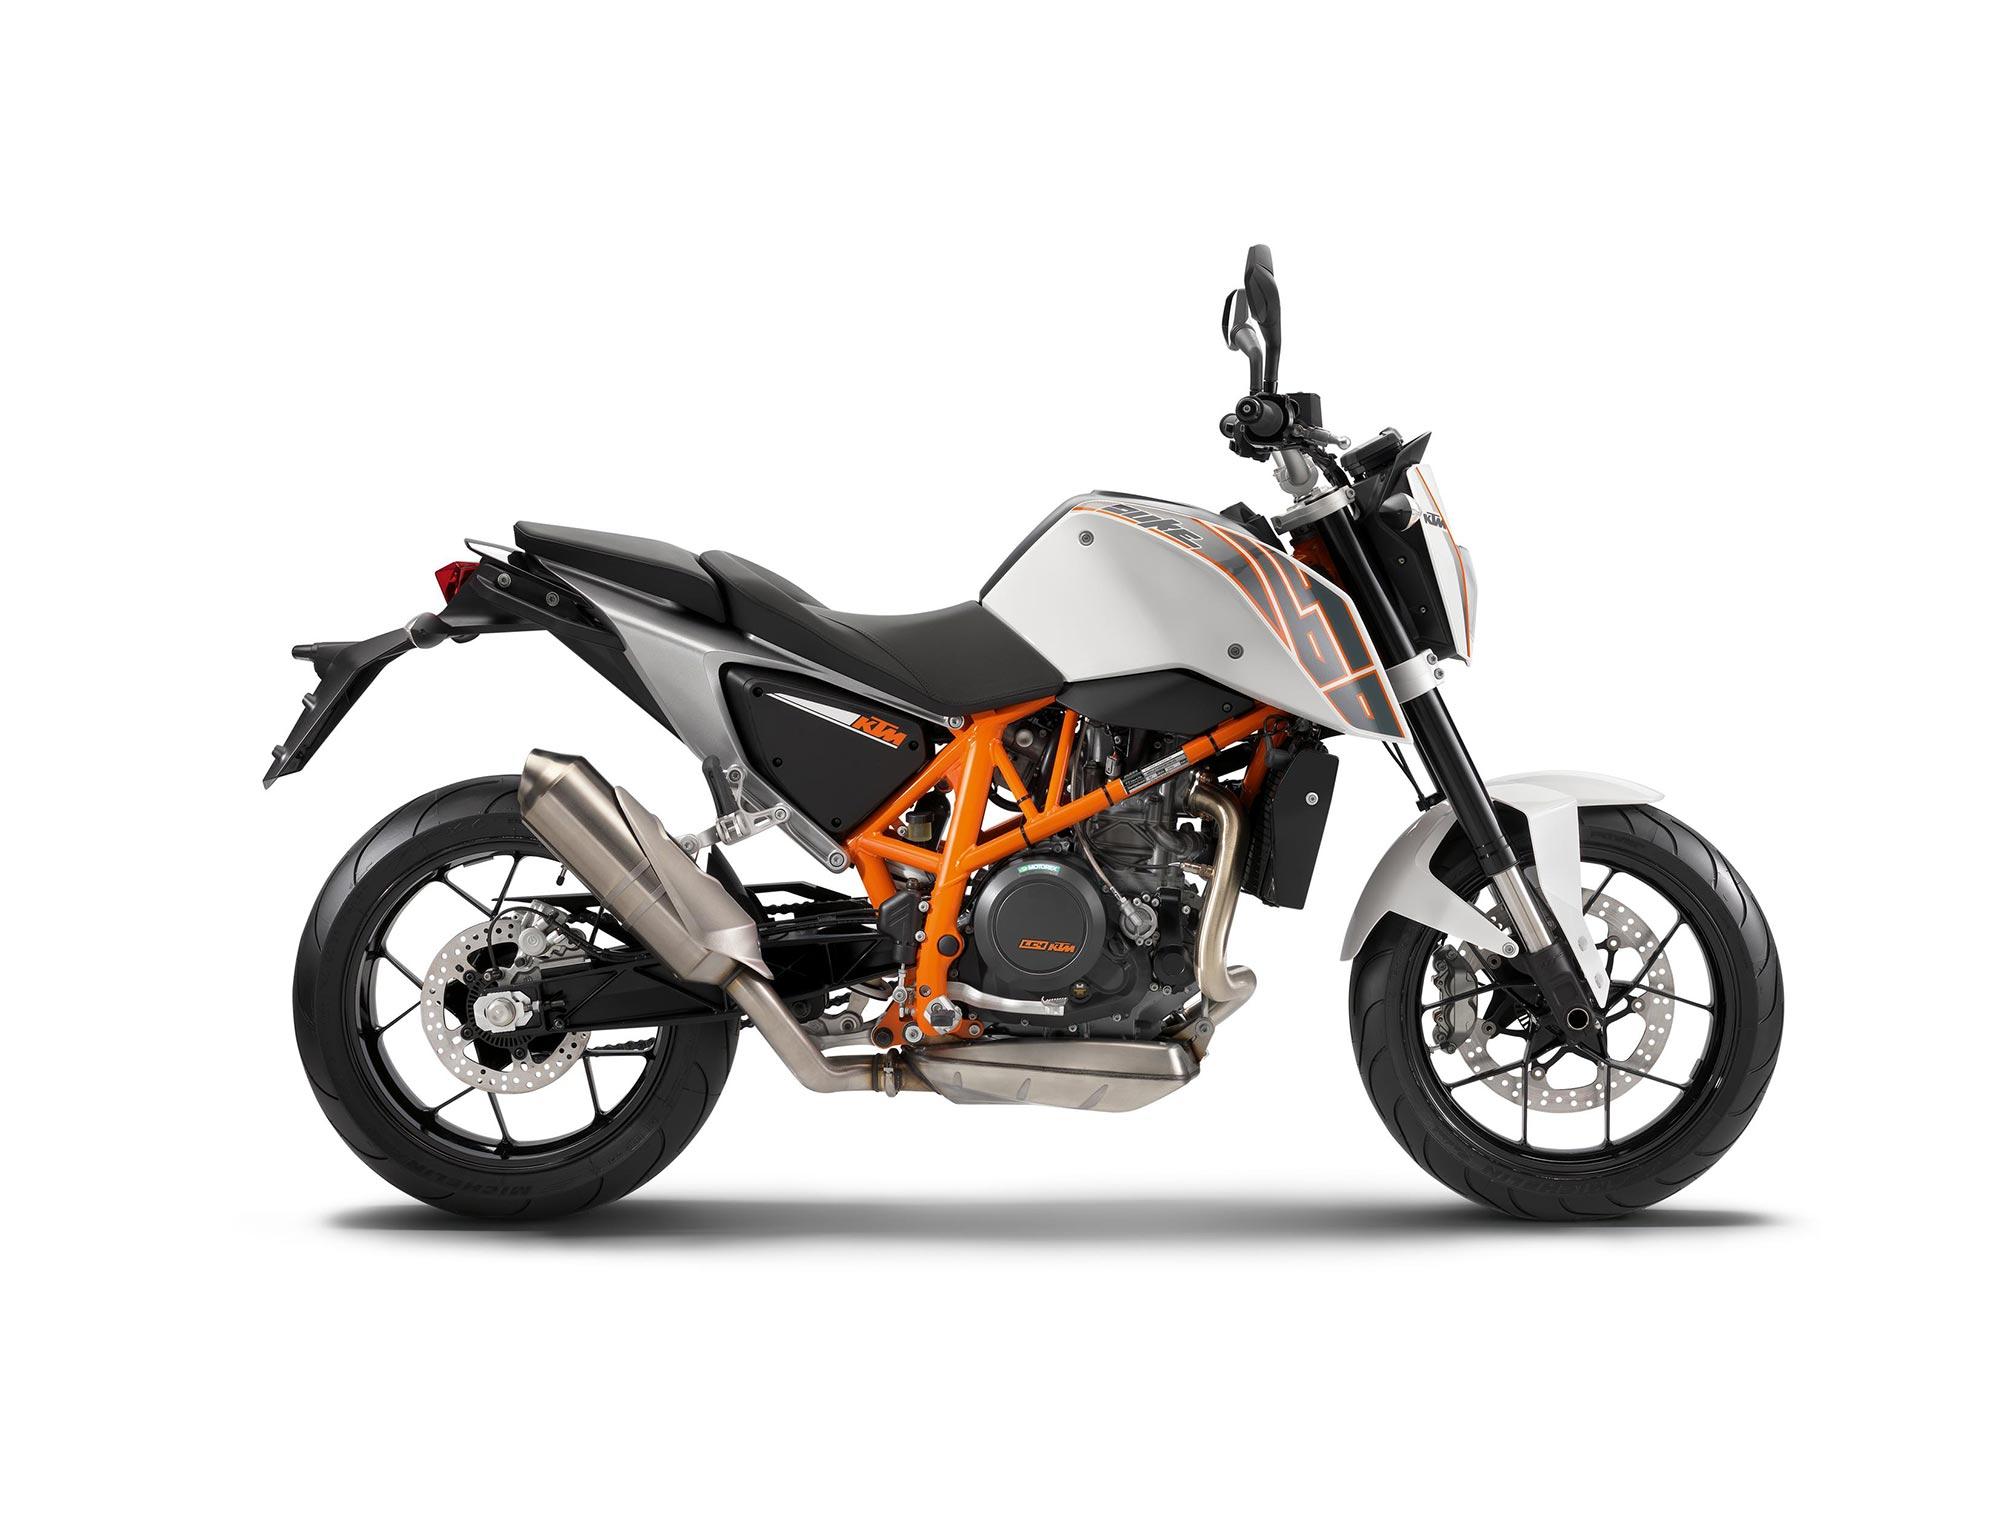 Supermoto ktm 690 stunt concept bikemotorcycletuned car tuning car - The